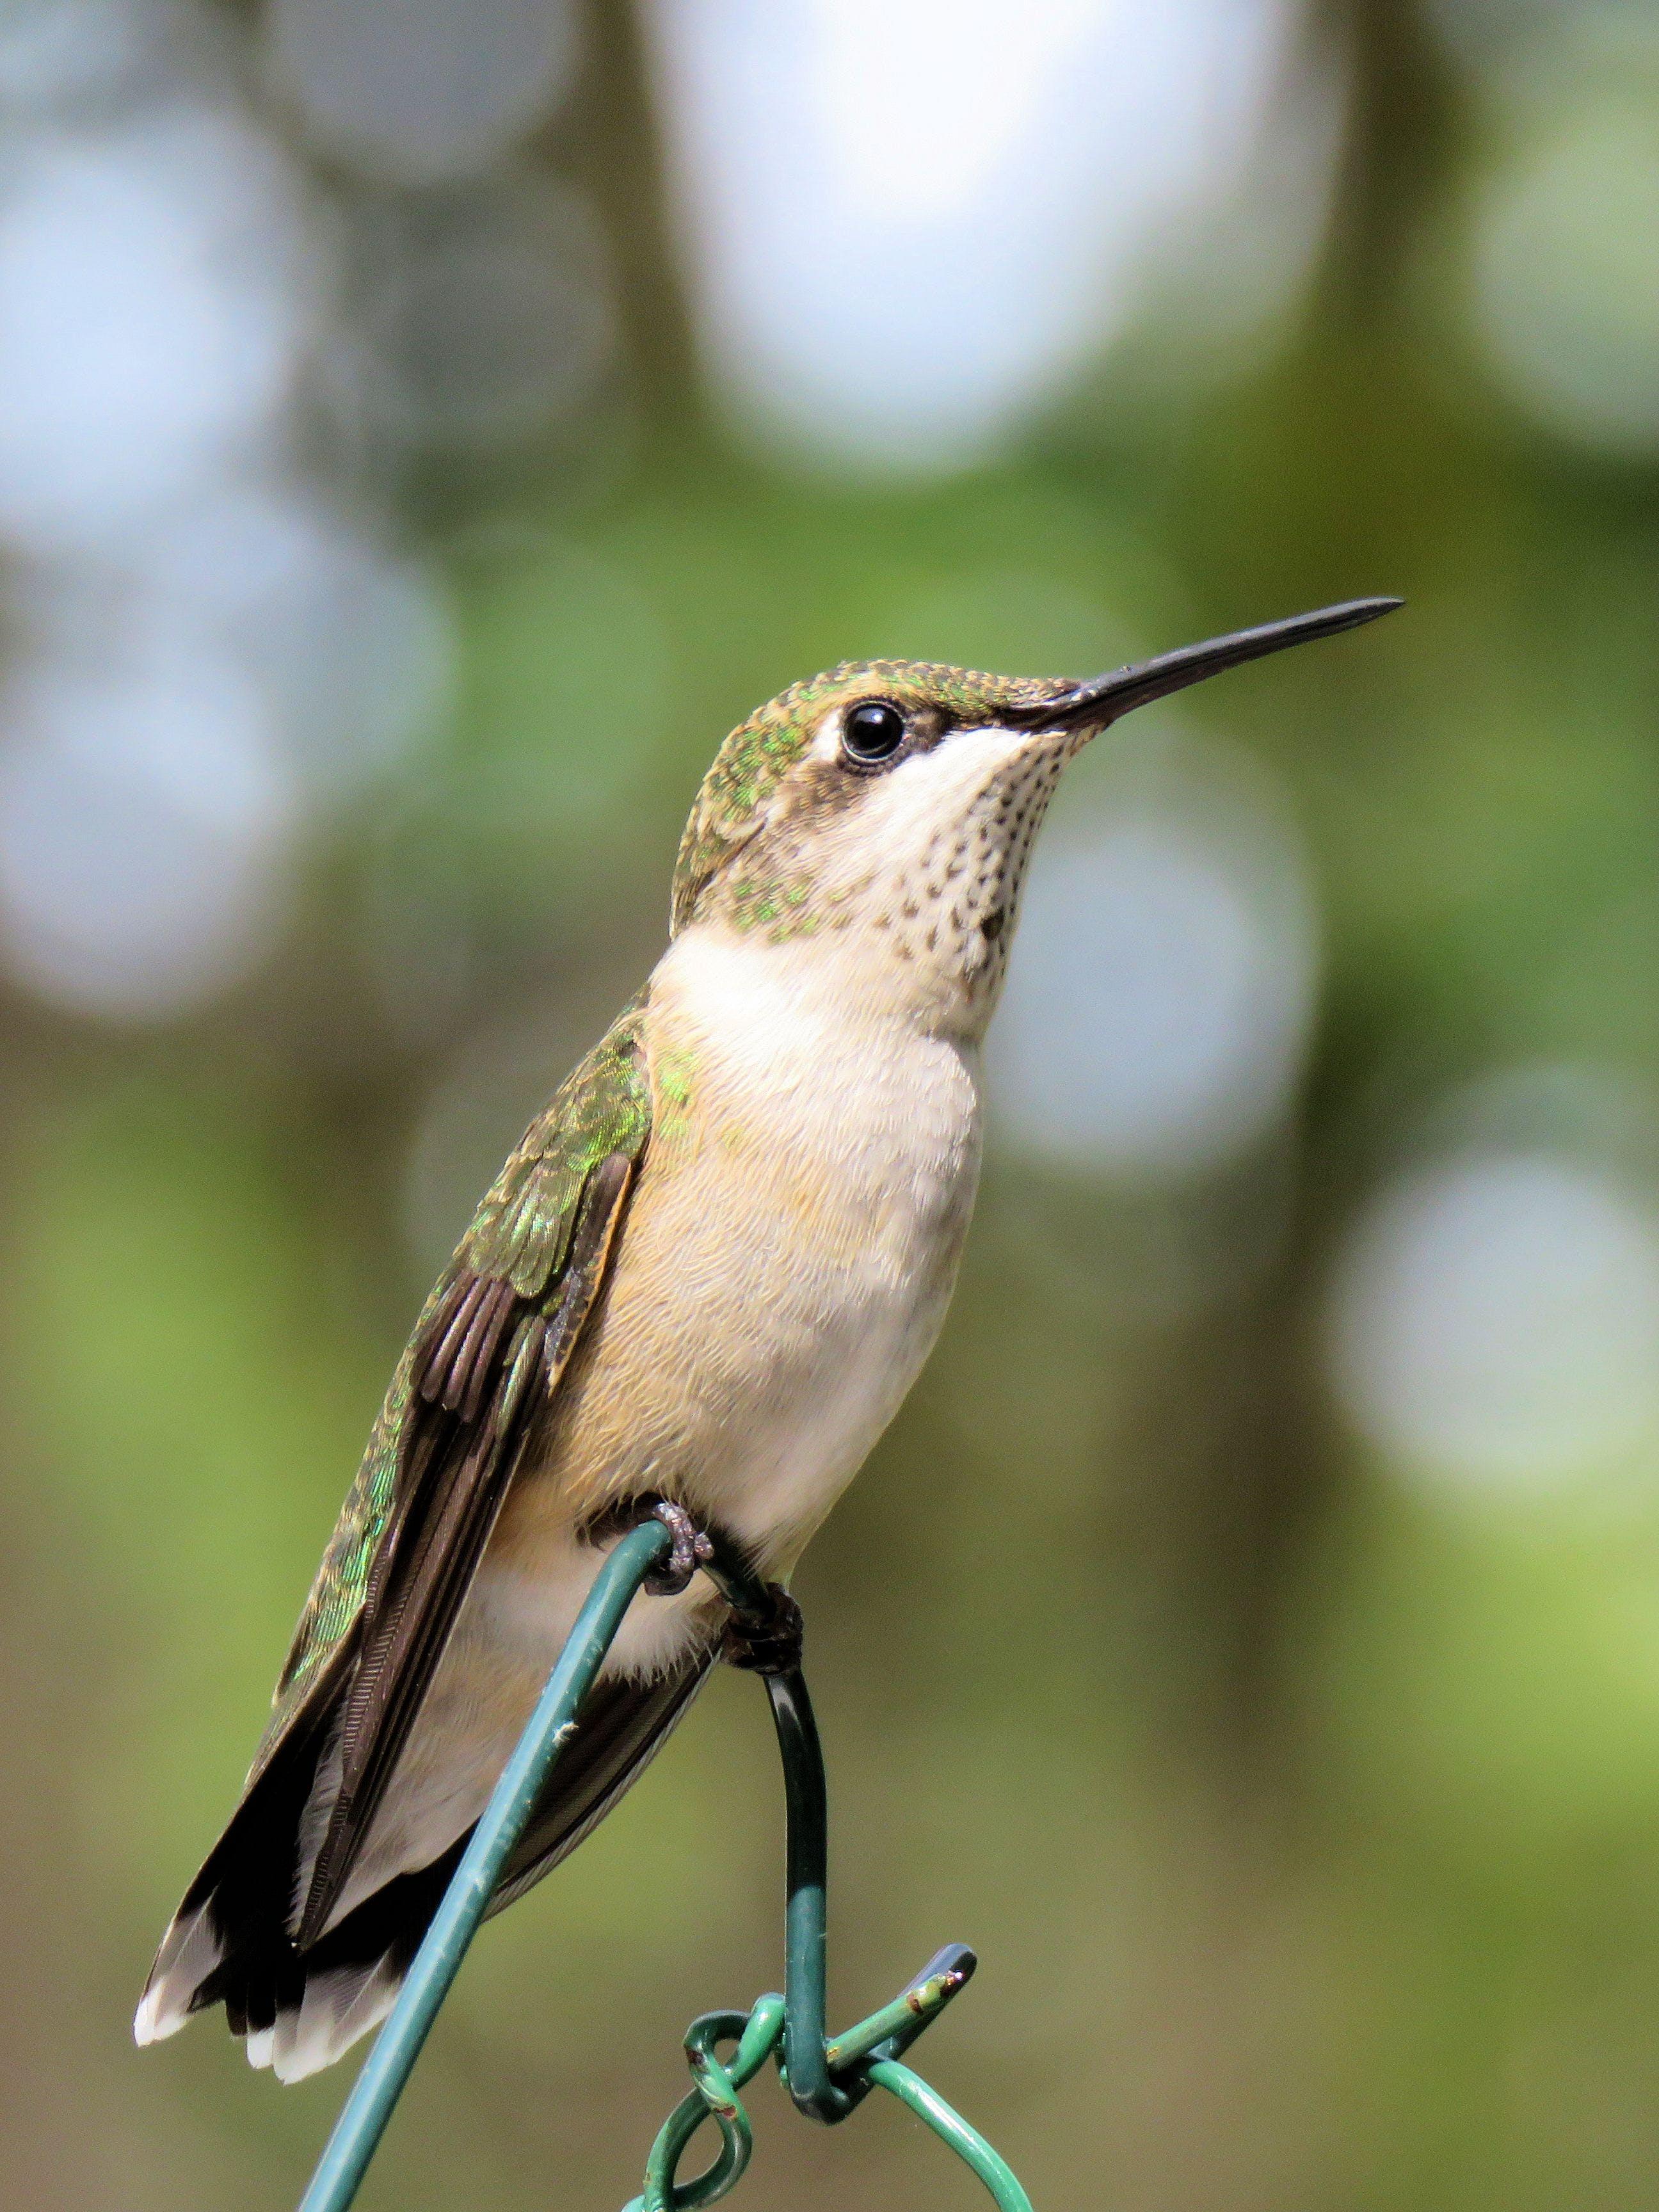 Gratis lagerfoto af kolibri